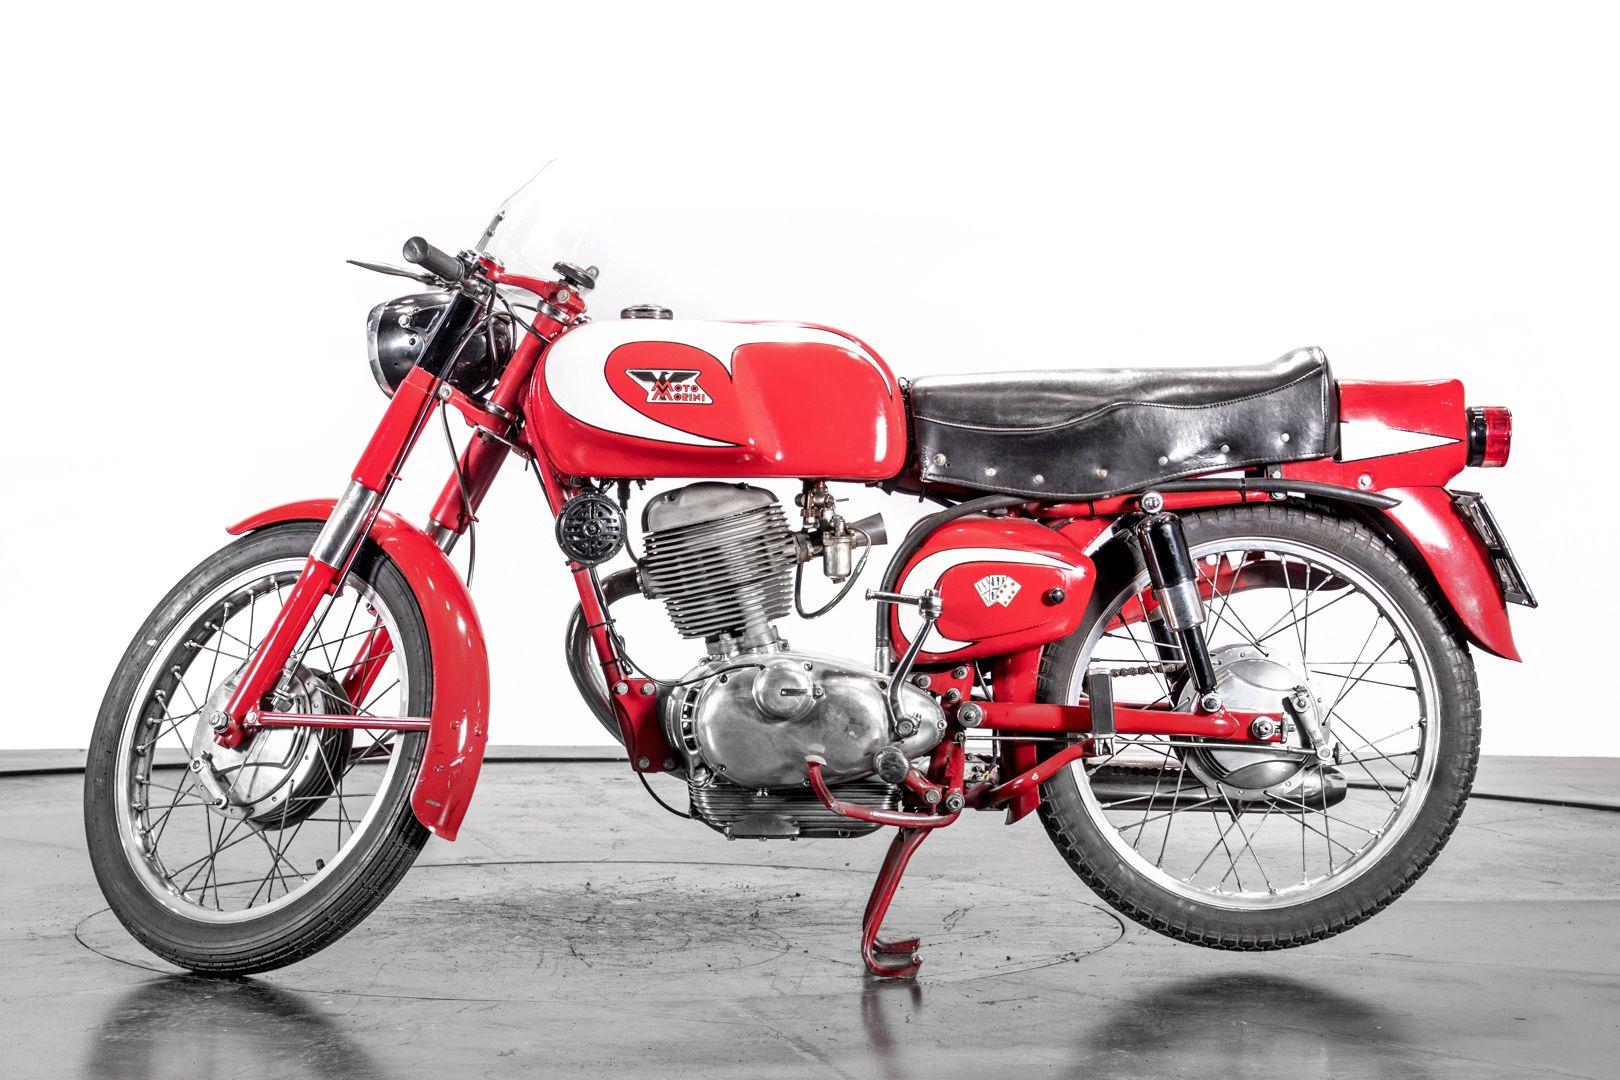 1957 Moto Morini 175 71733